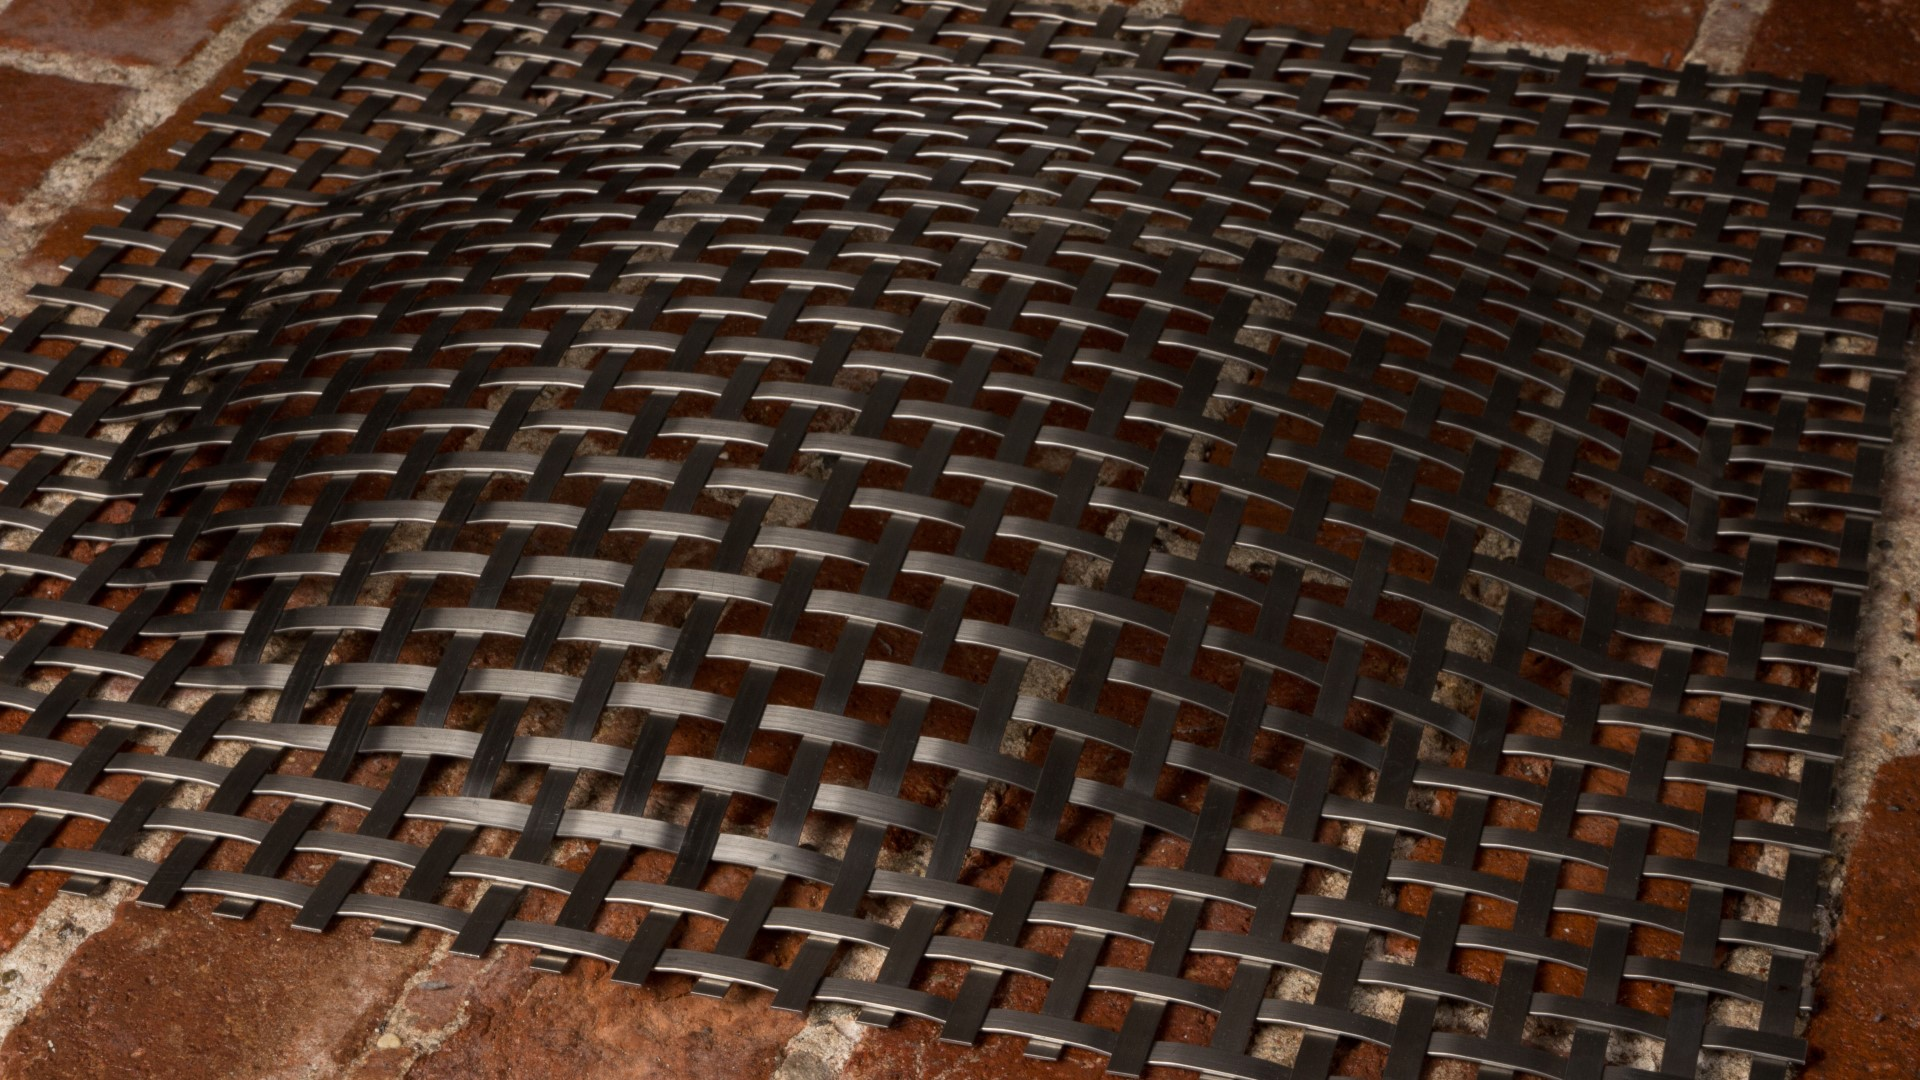 3D Platte Typ Kugelsegmente aus rostfreiem Edelstahl Mesh